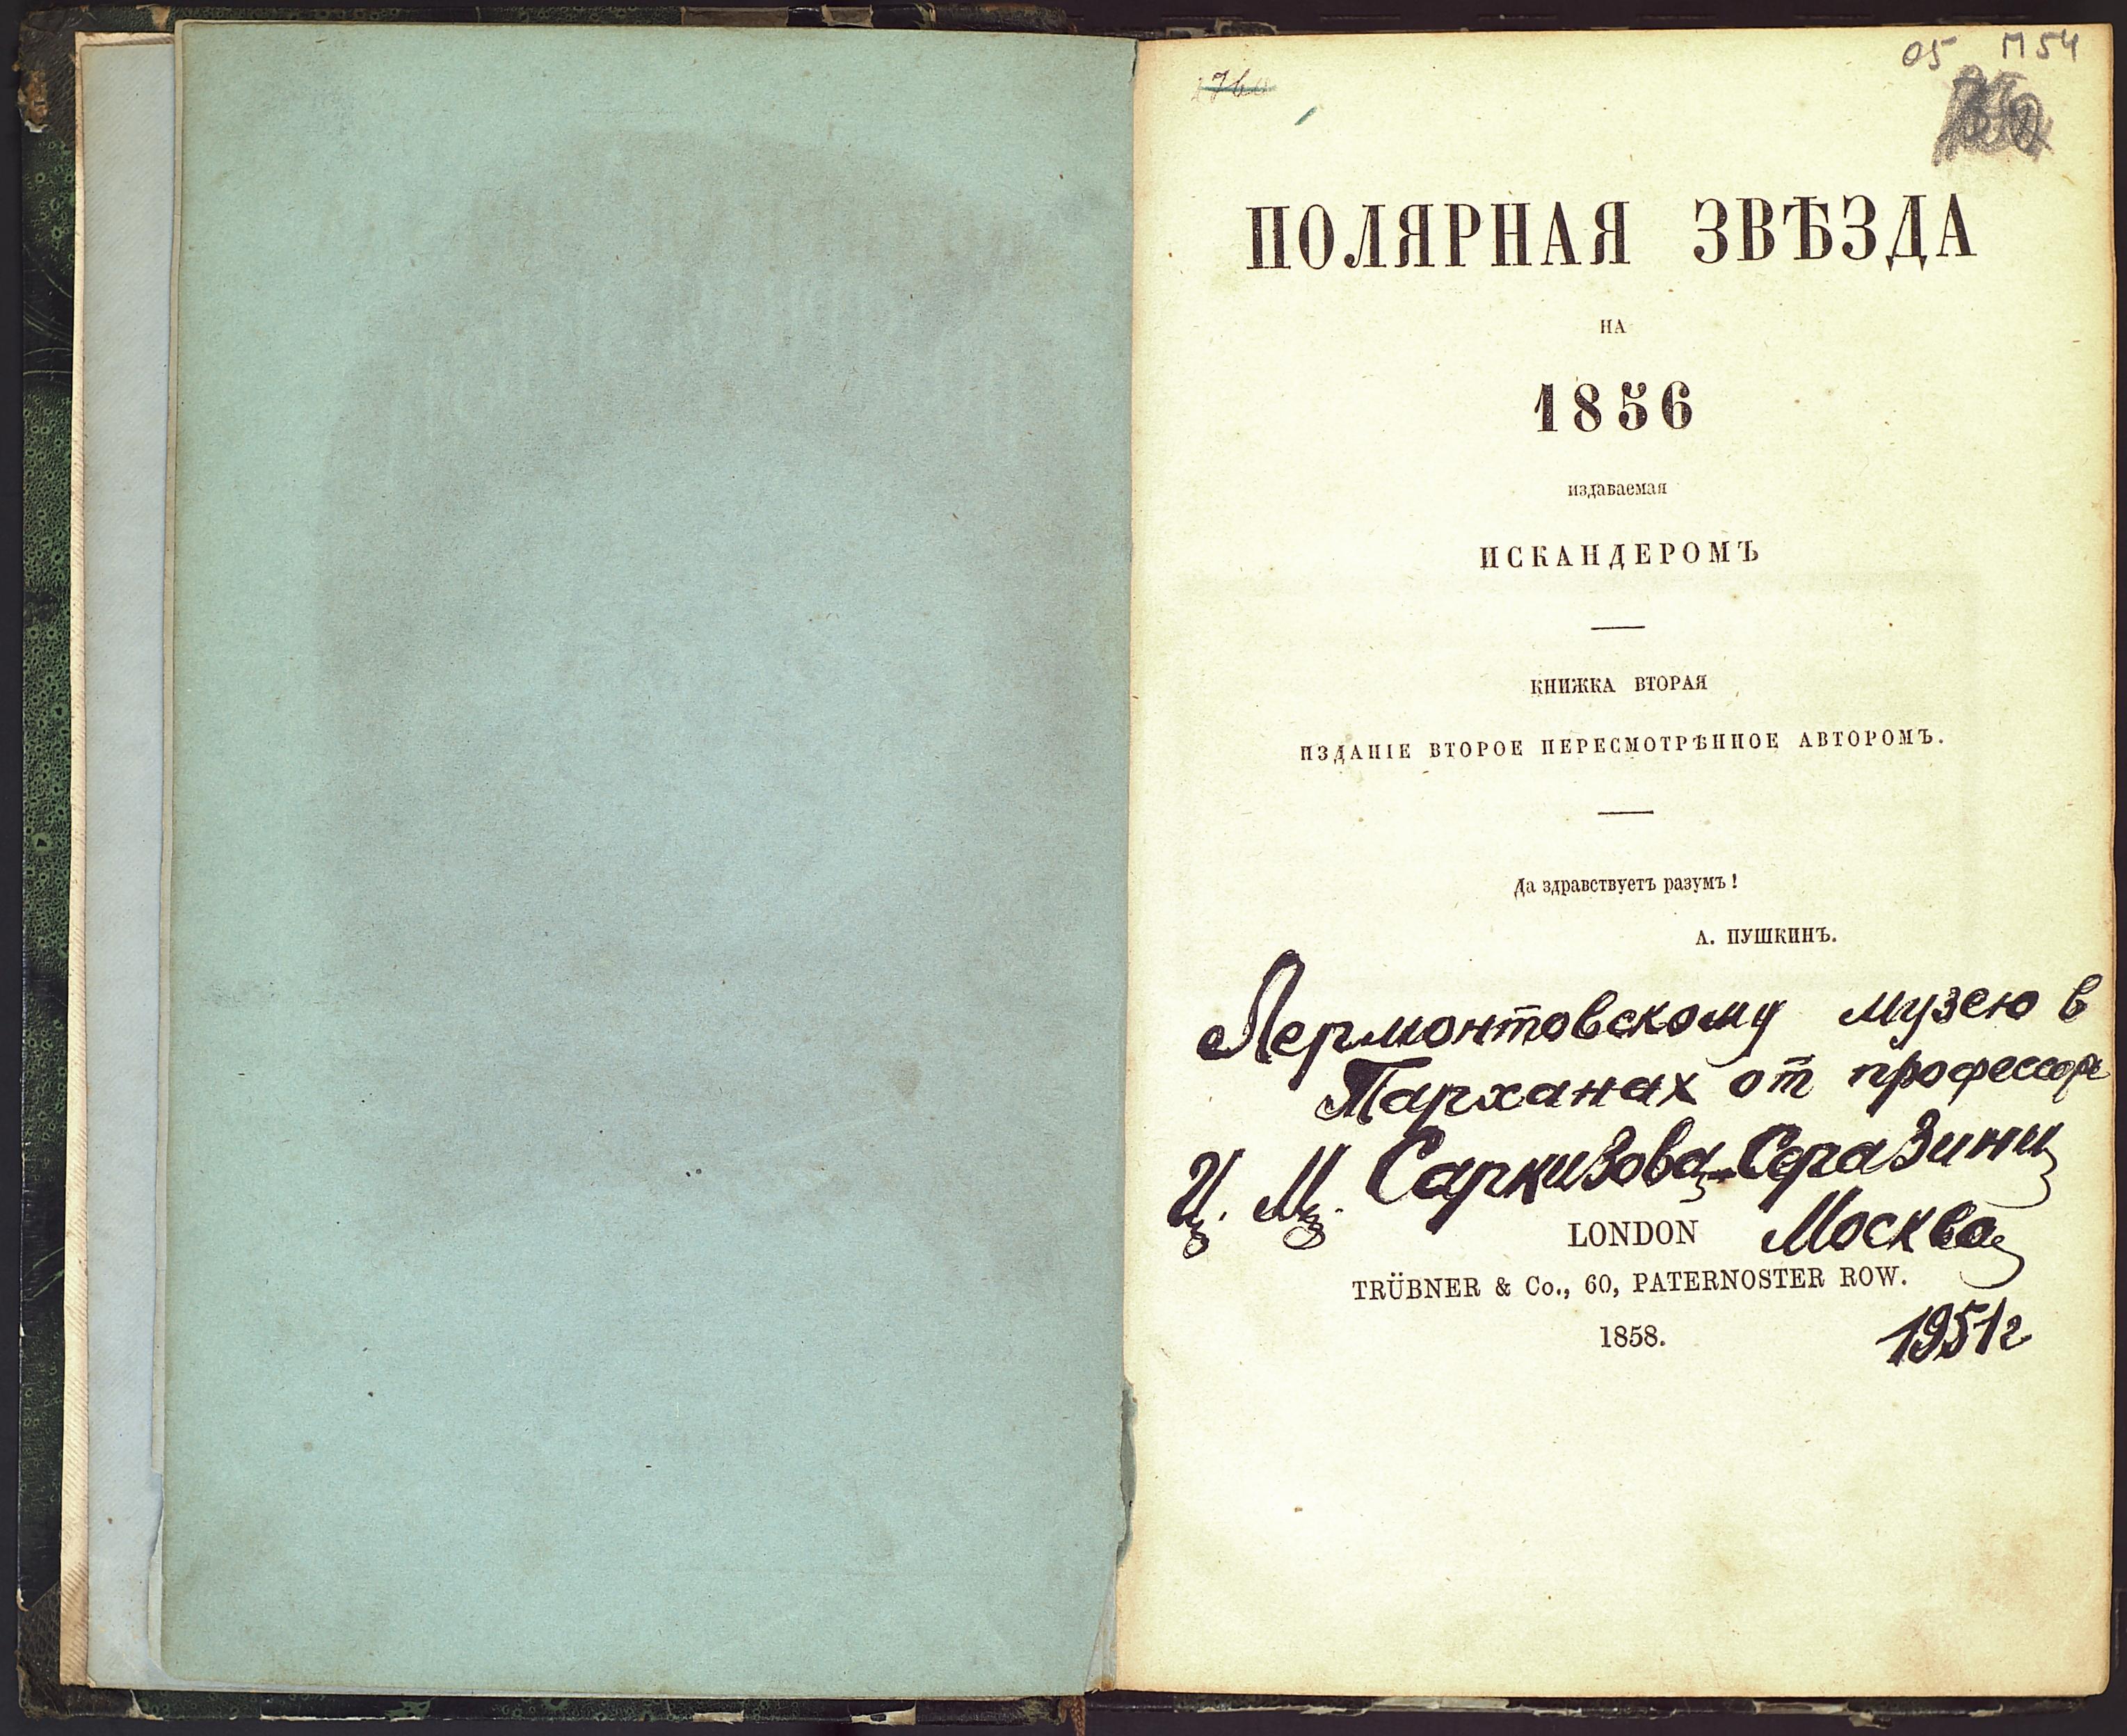 ЛОК-1744 ТАРХАНЫ КП-3567  Книга Полярная звезда на 1856 год издаваемая Искандером.  Кн. 2._2